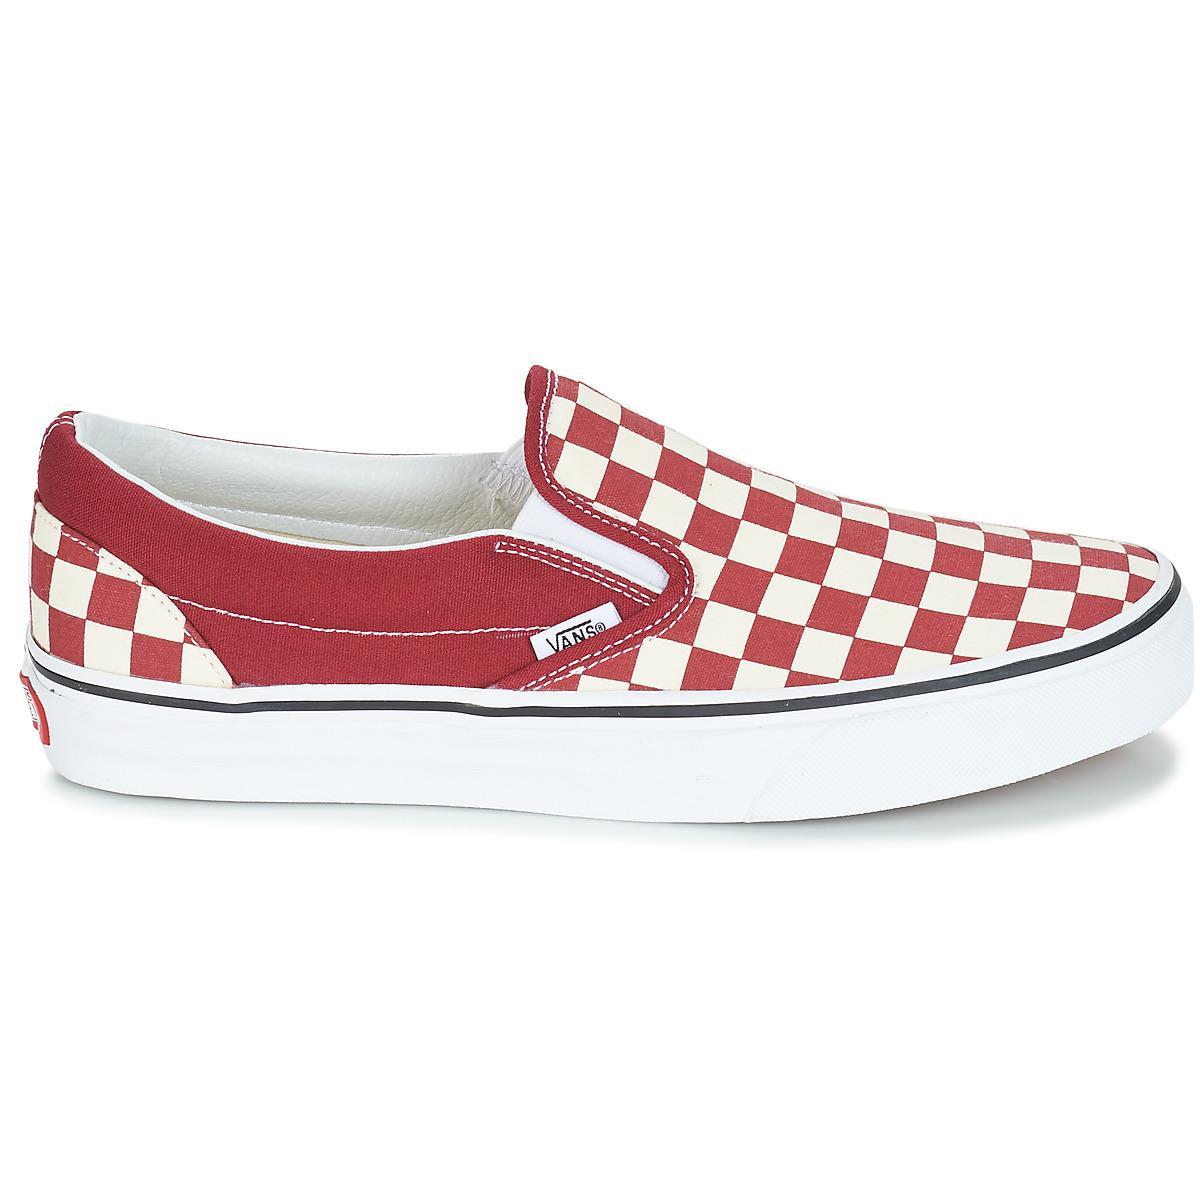 CLASSIC SLIP-ON femmes Chaussures en rouge